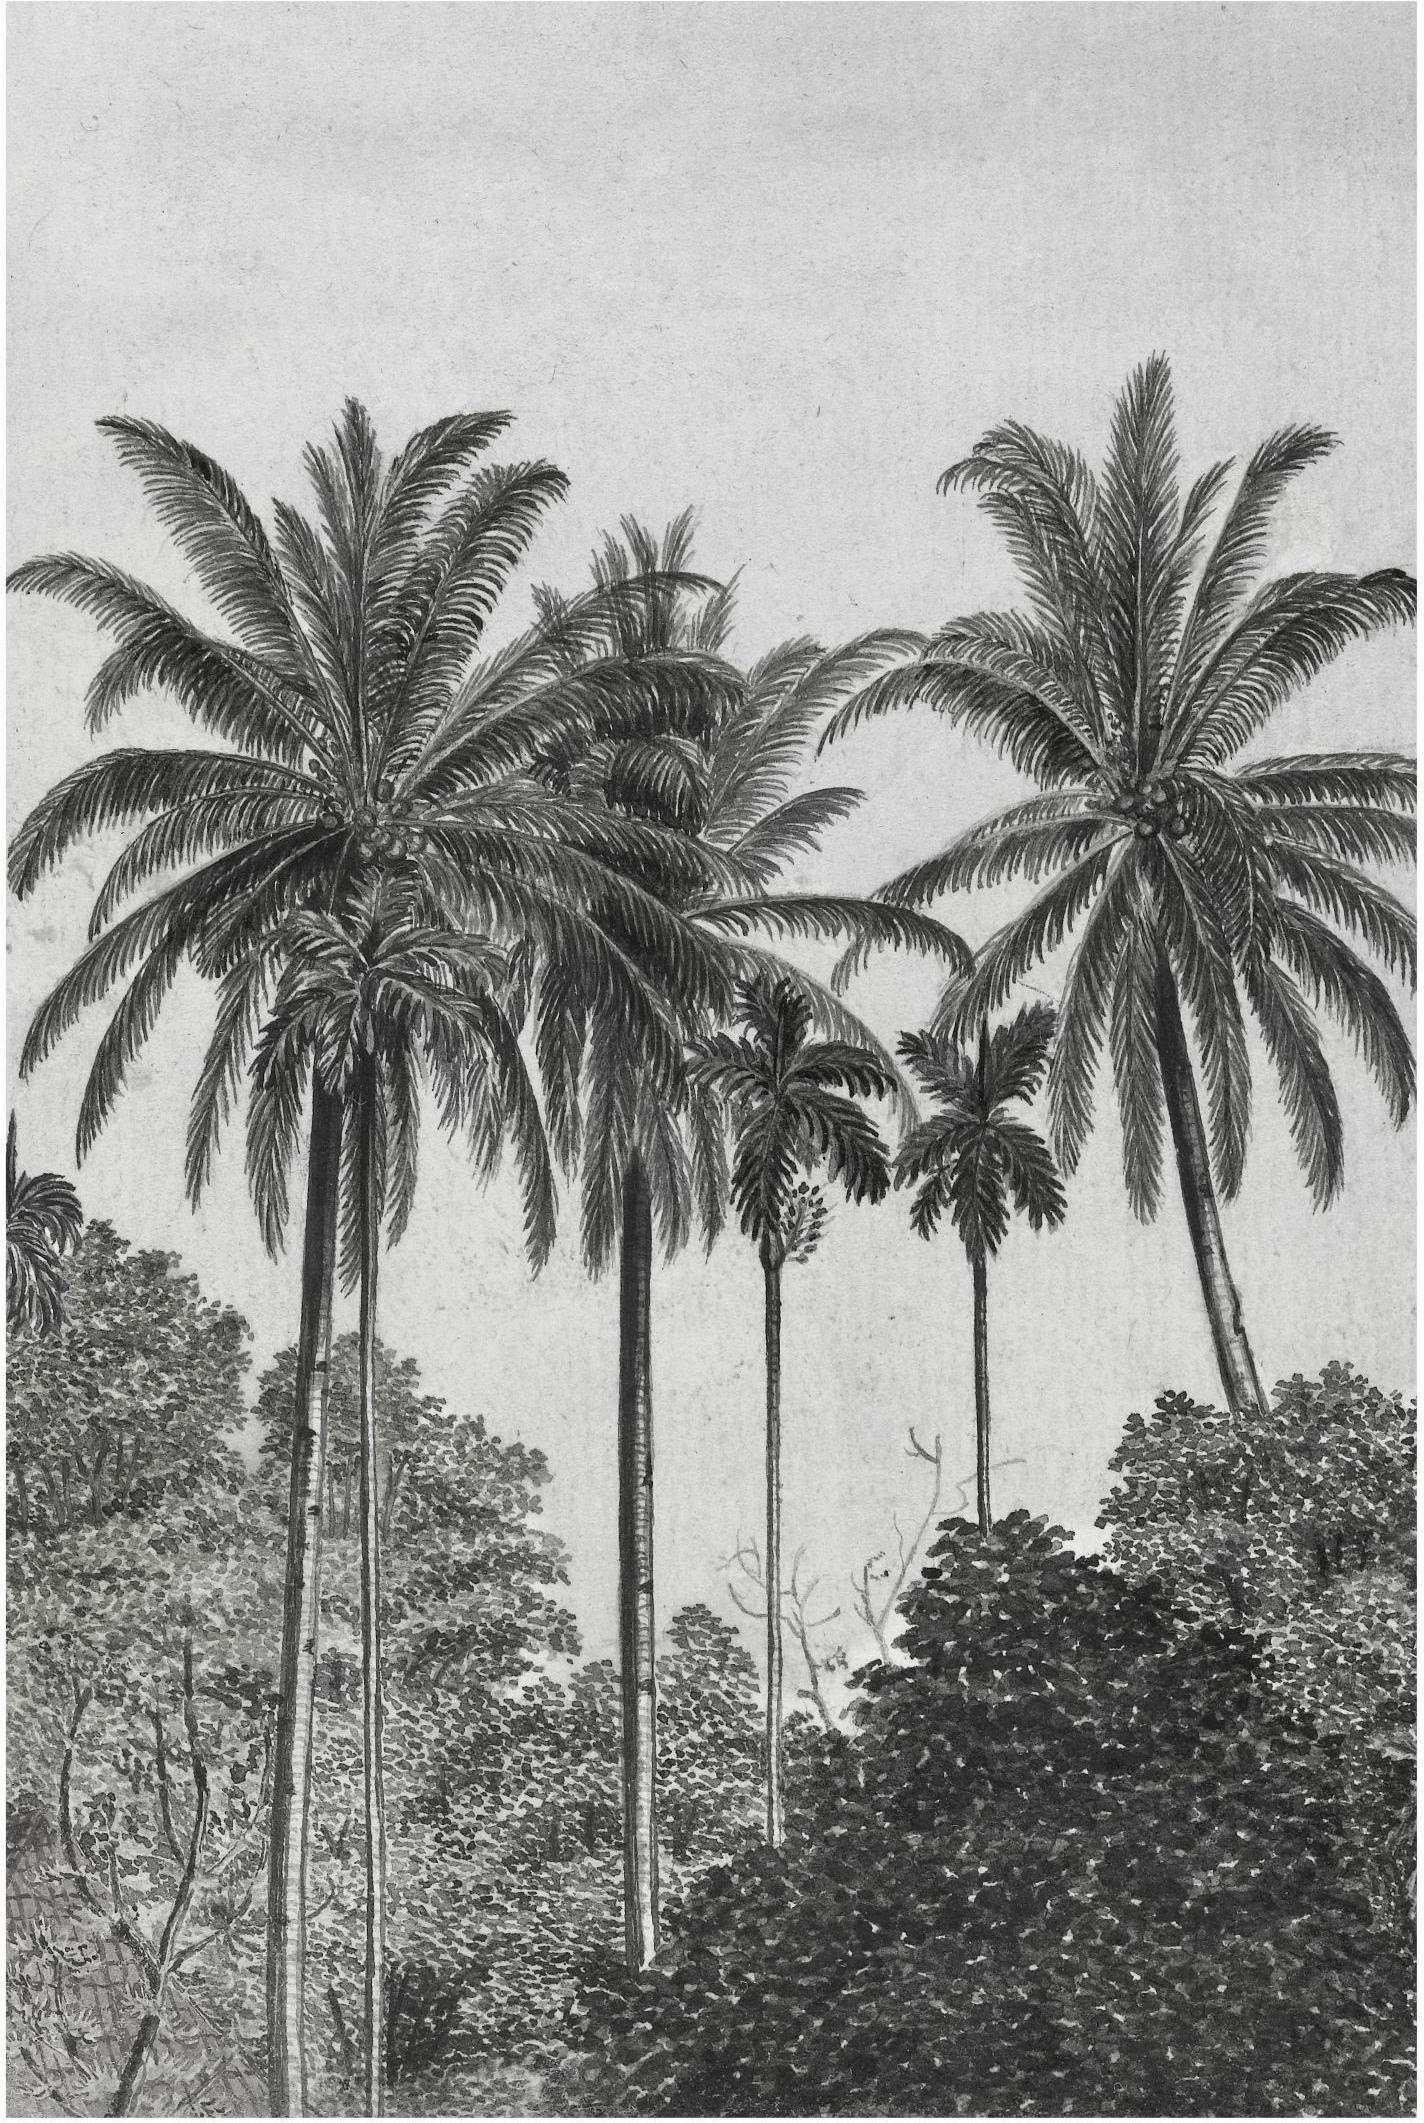 Carta da parati Palms, Tessuto non tessuto, Grigio, nero, bianco, Larg. 200 x Alt. 300 cm